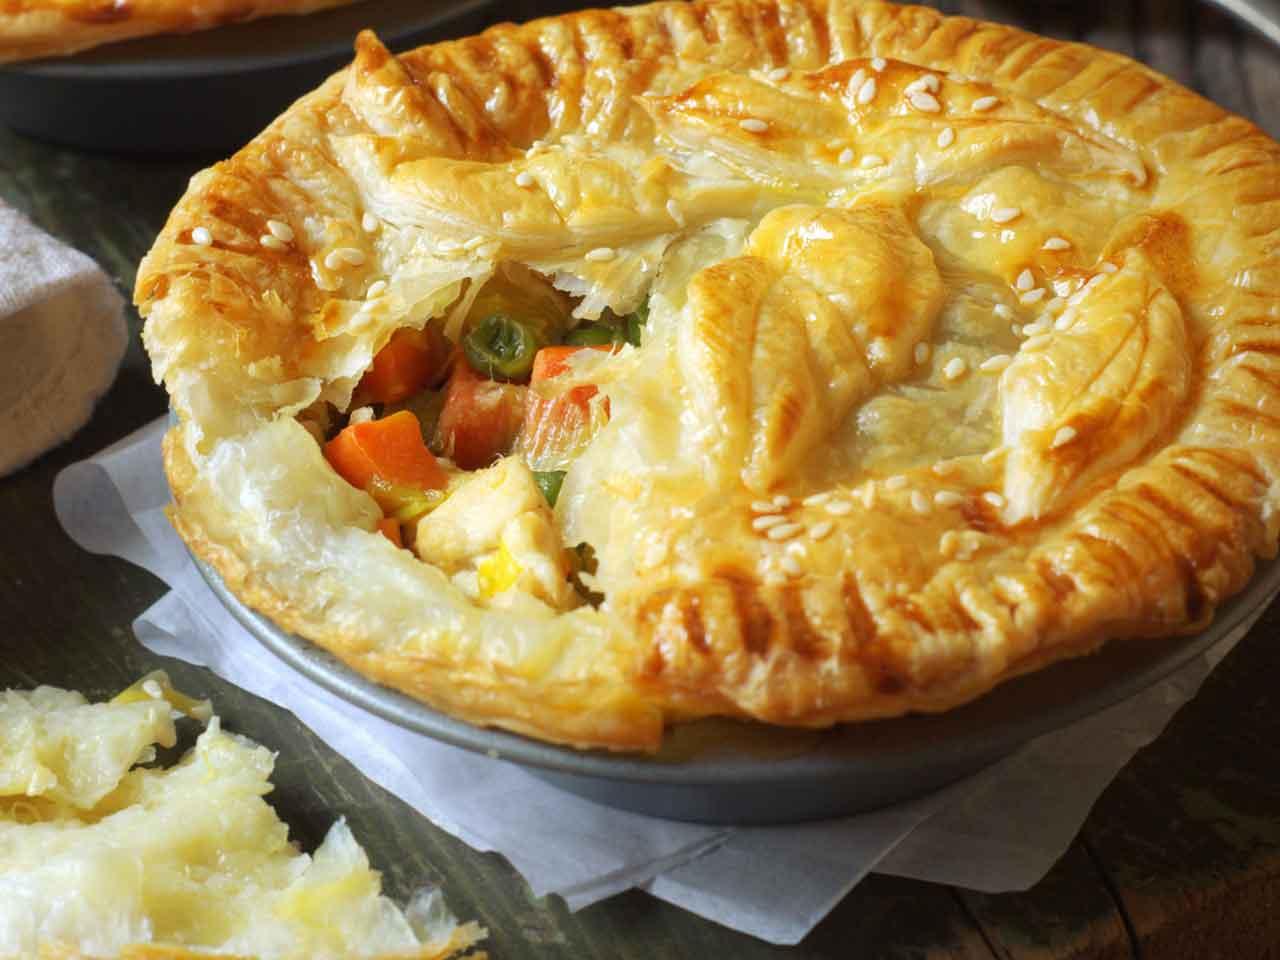 Woolton pie saga woolton pie forumfinder Image collections